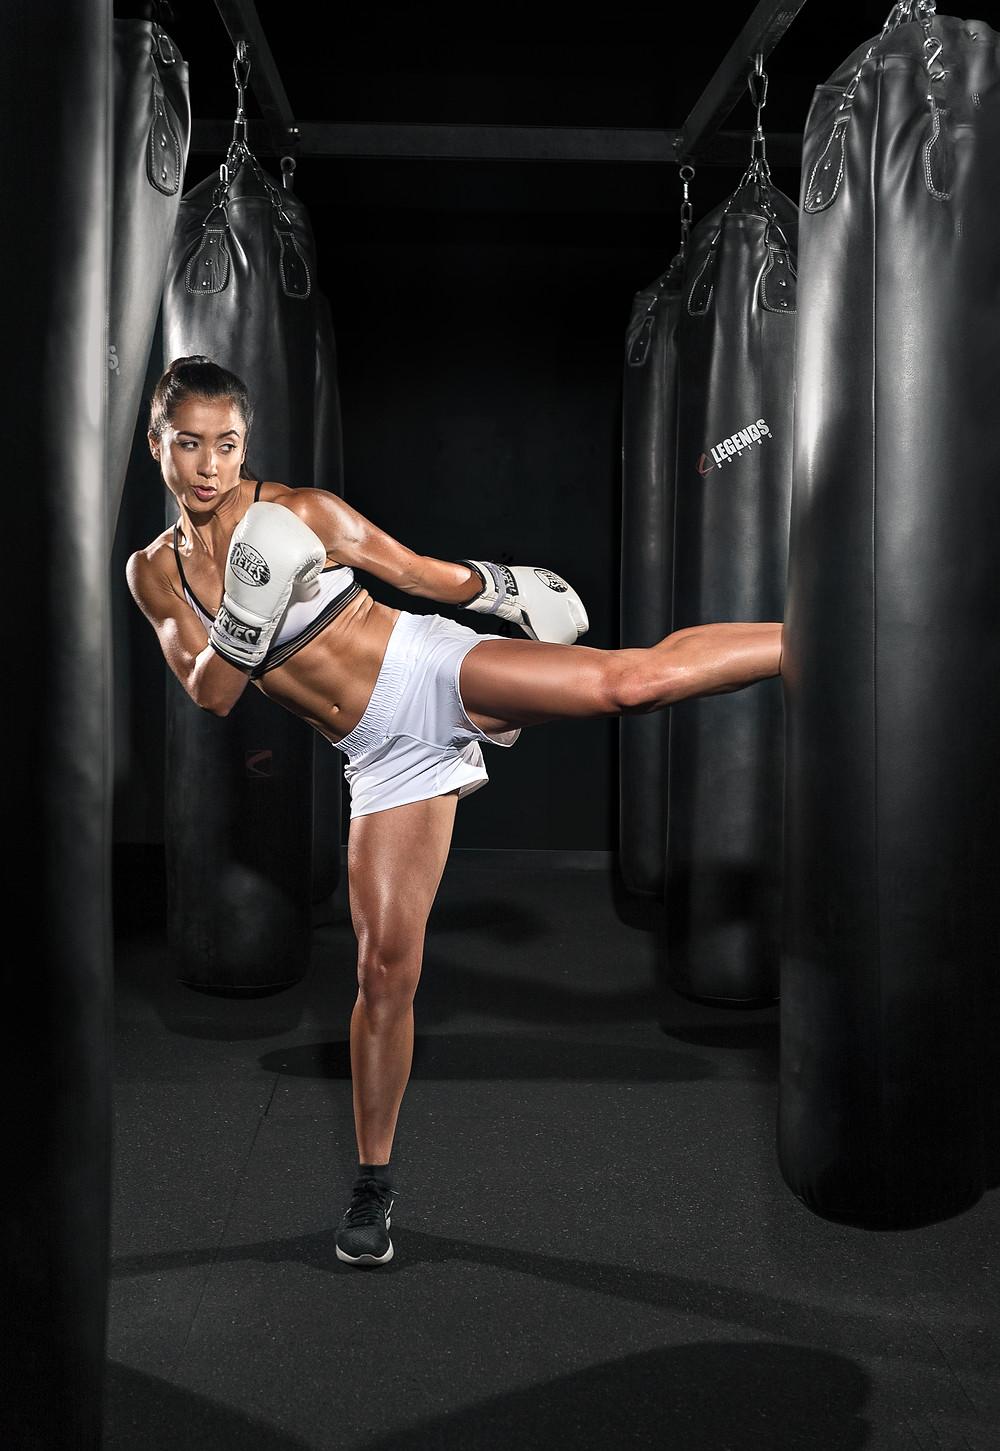 Sports Photography Kickboxing